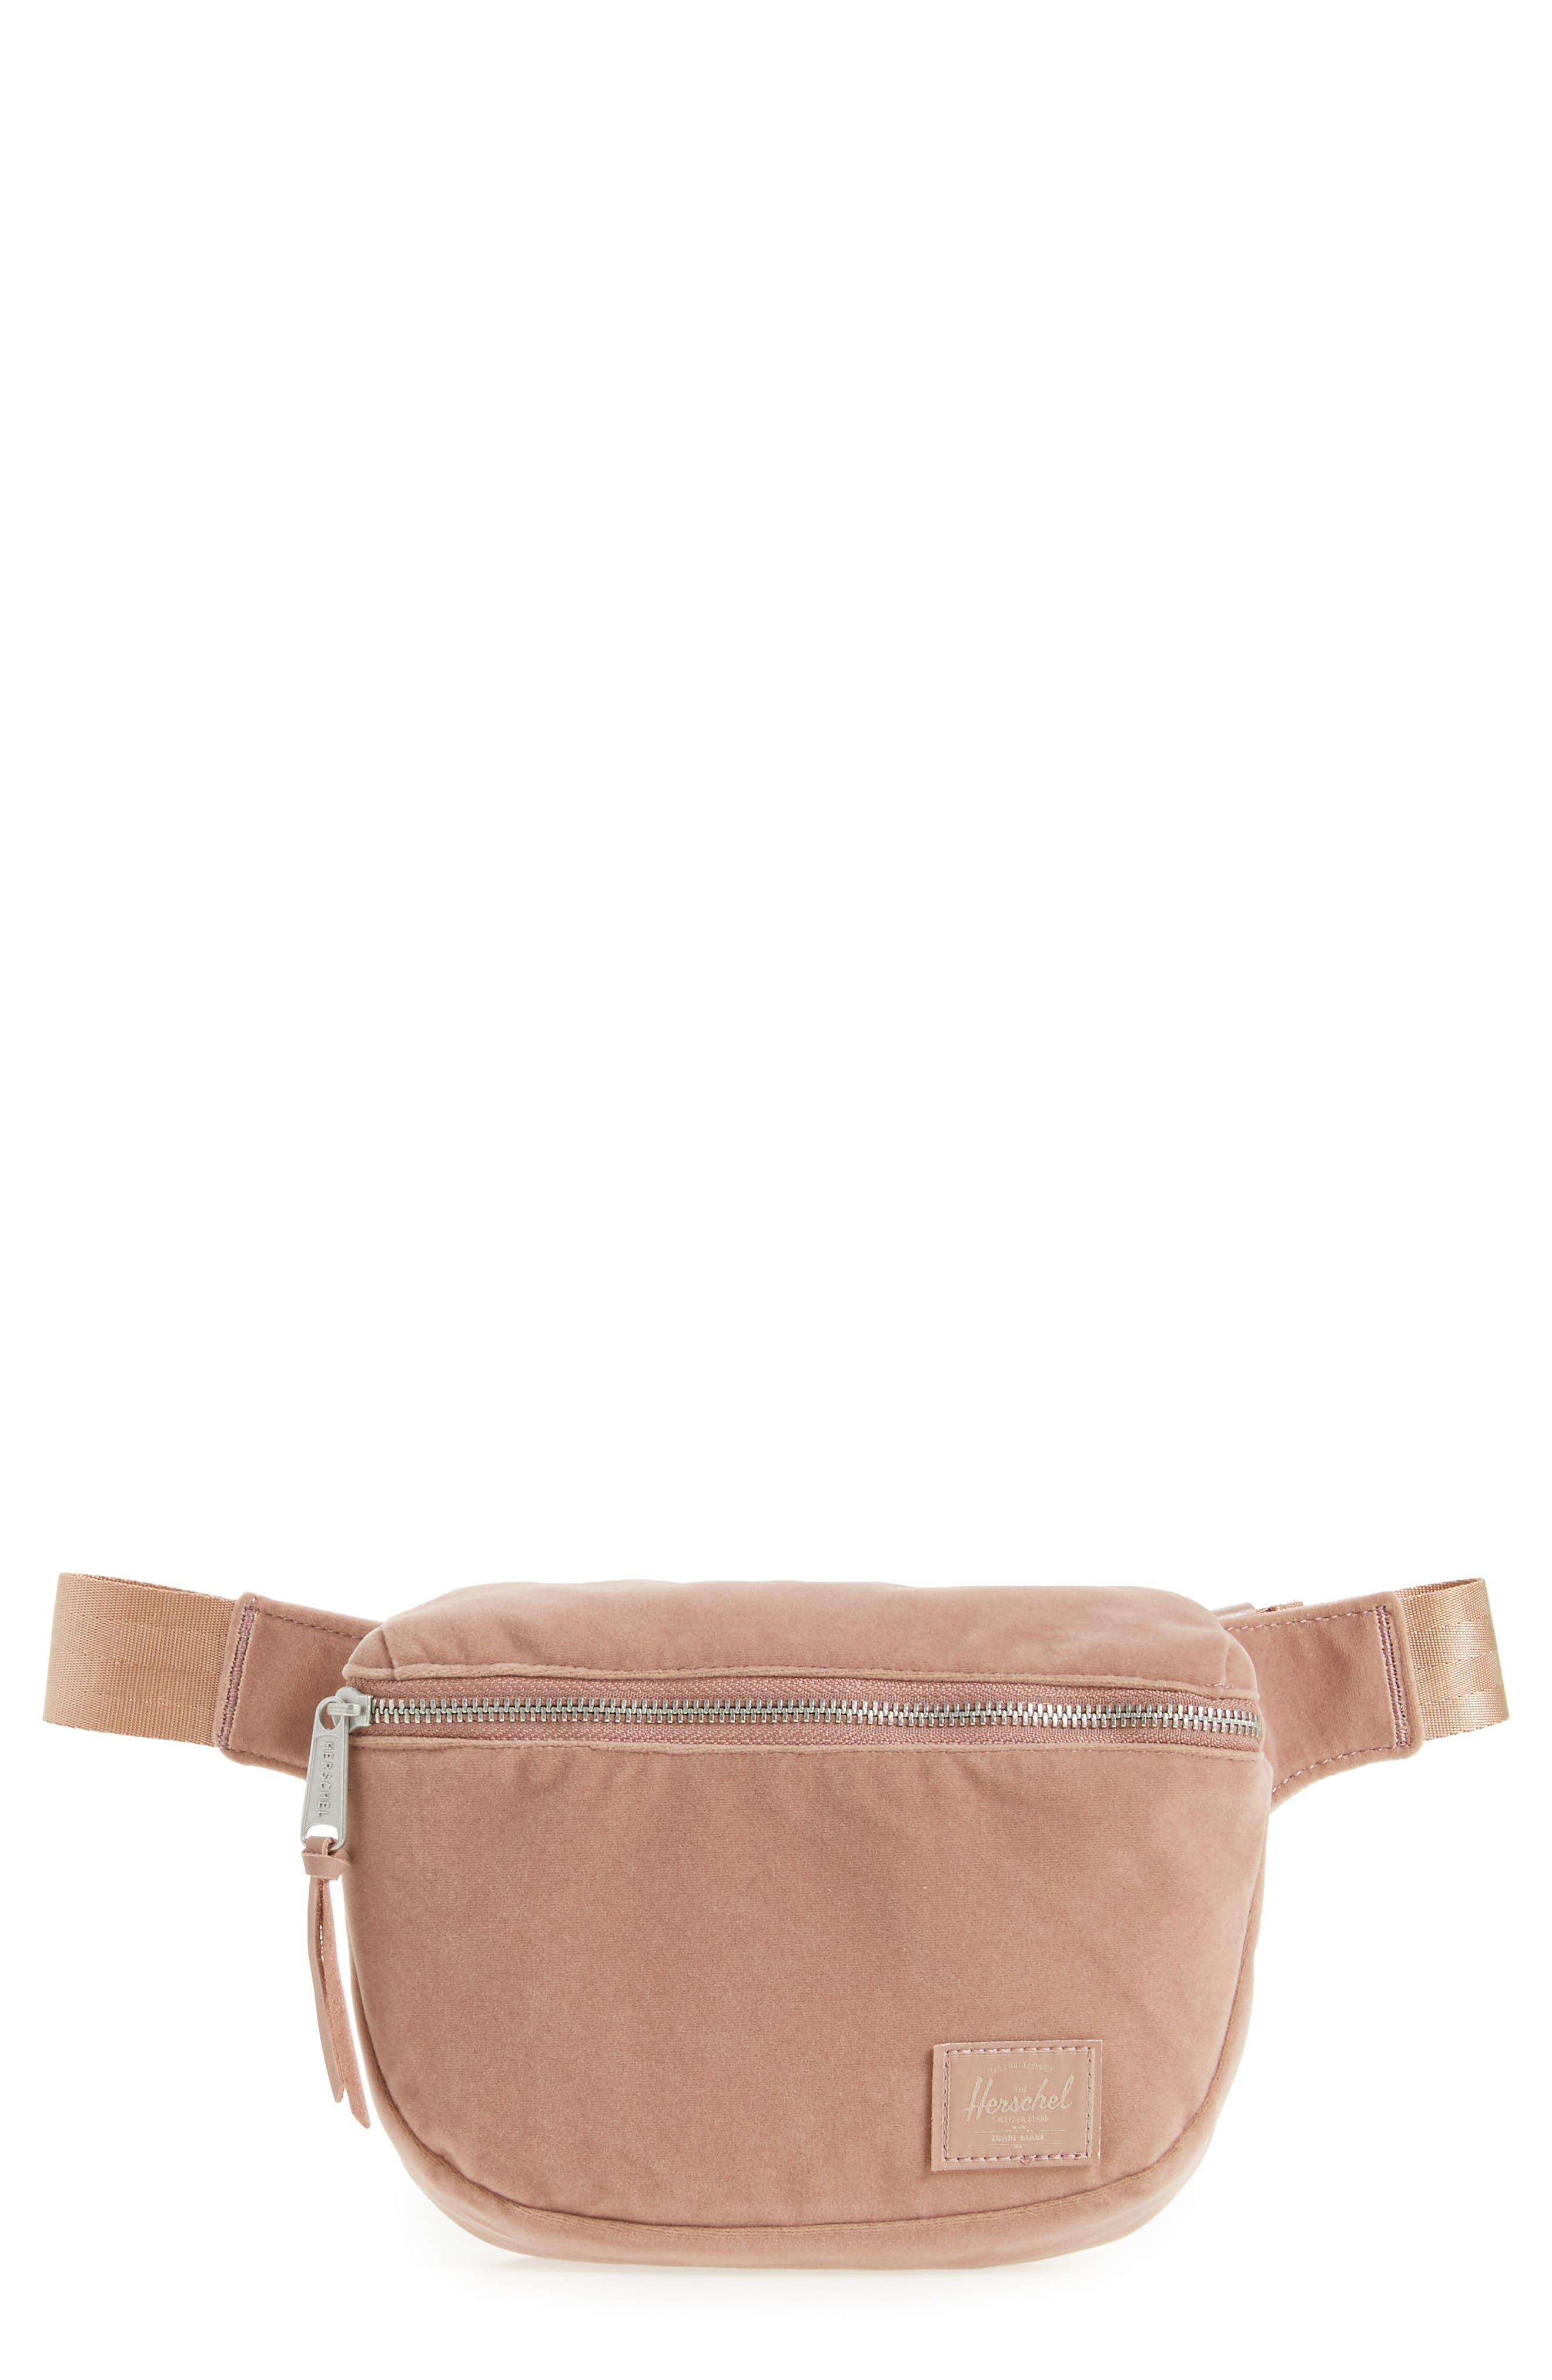 Fifteen Velvet Belt Bag,                         Main,                         color, Ash Rose